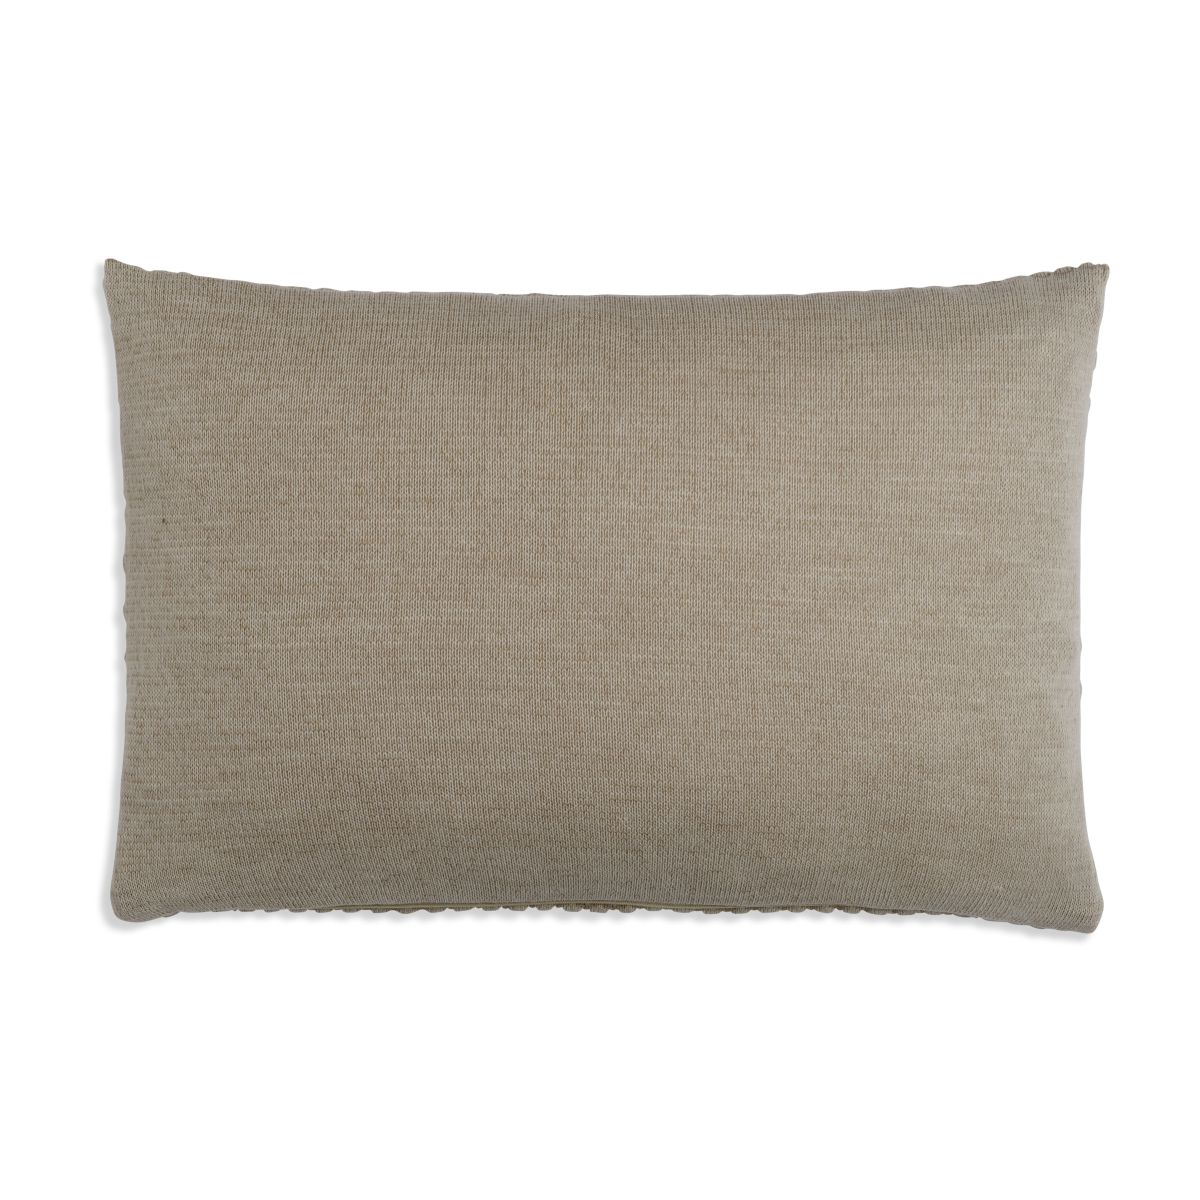 knit factory 1241357 kussen 60x40 juul seda olive 2